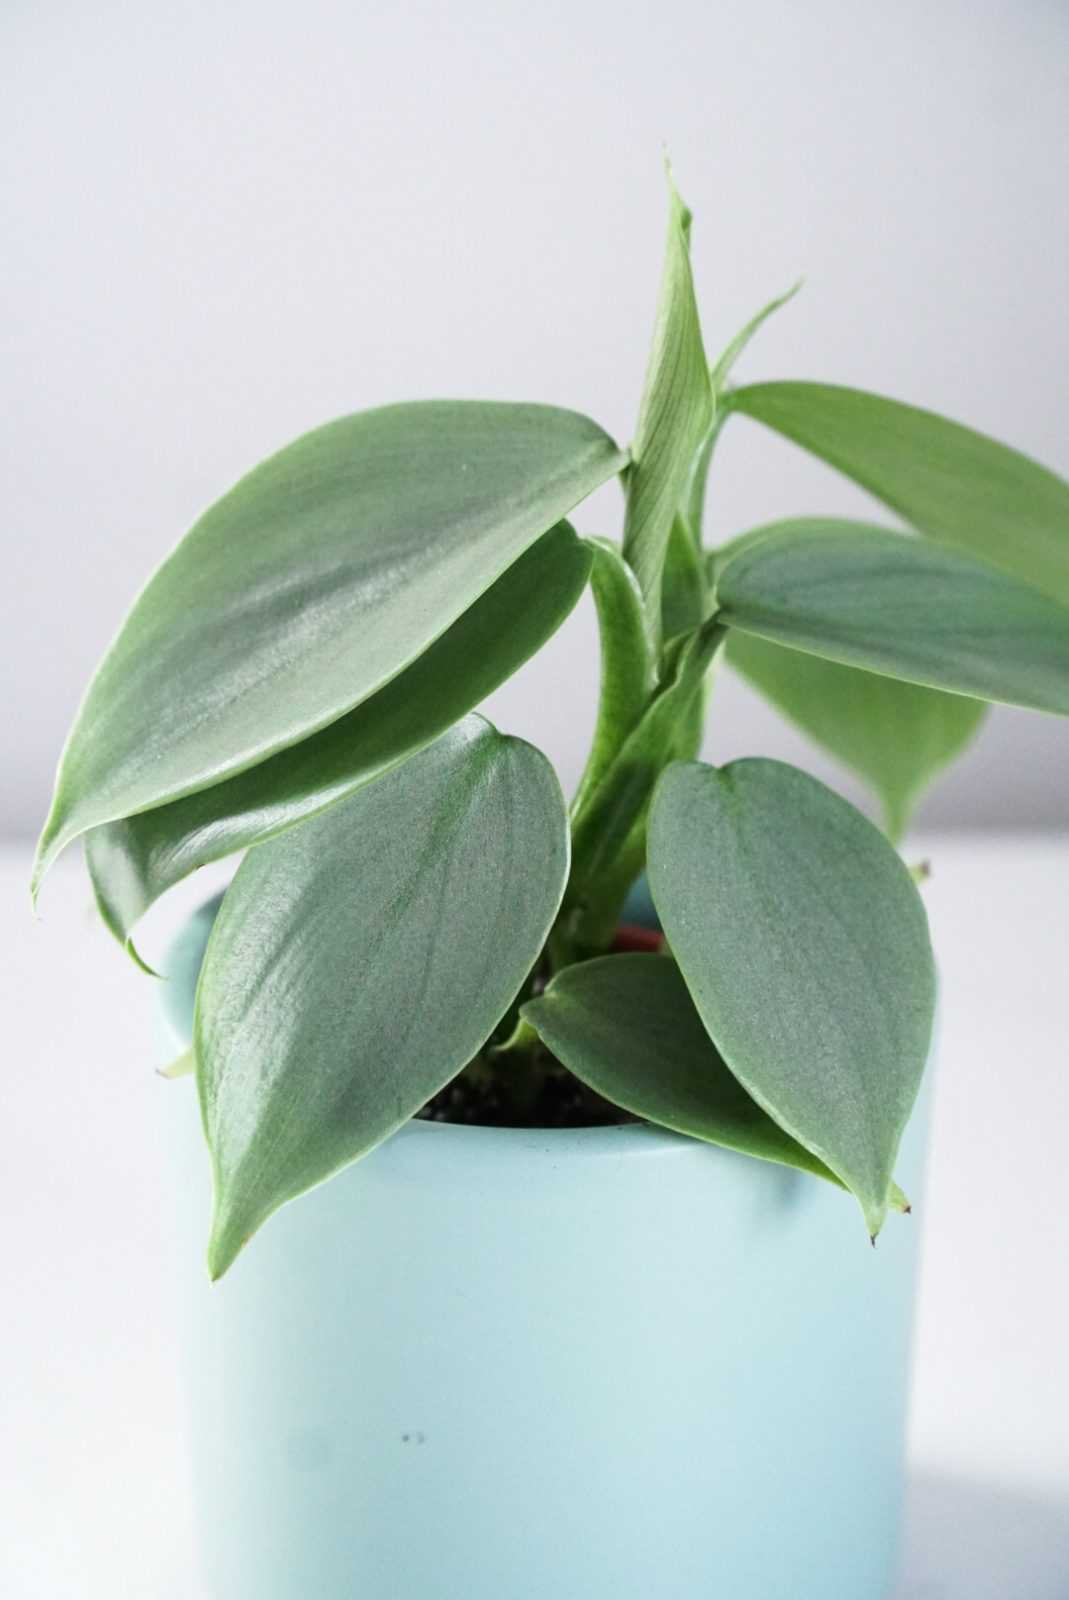 Philodendron Silver Sword buitenplant kamerplant plant plantje stek stekje terracotta pot potje glas glaasje